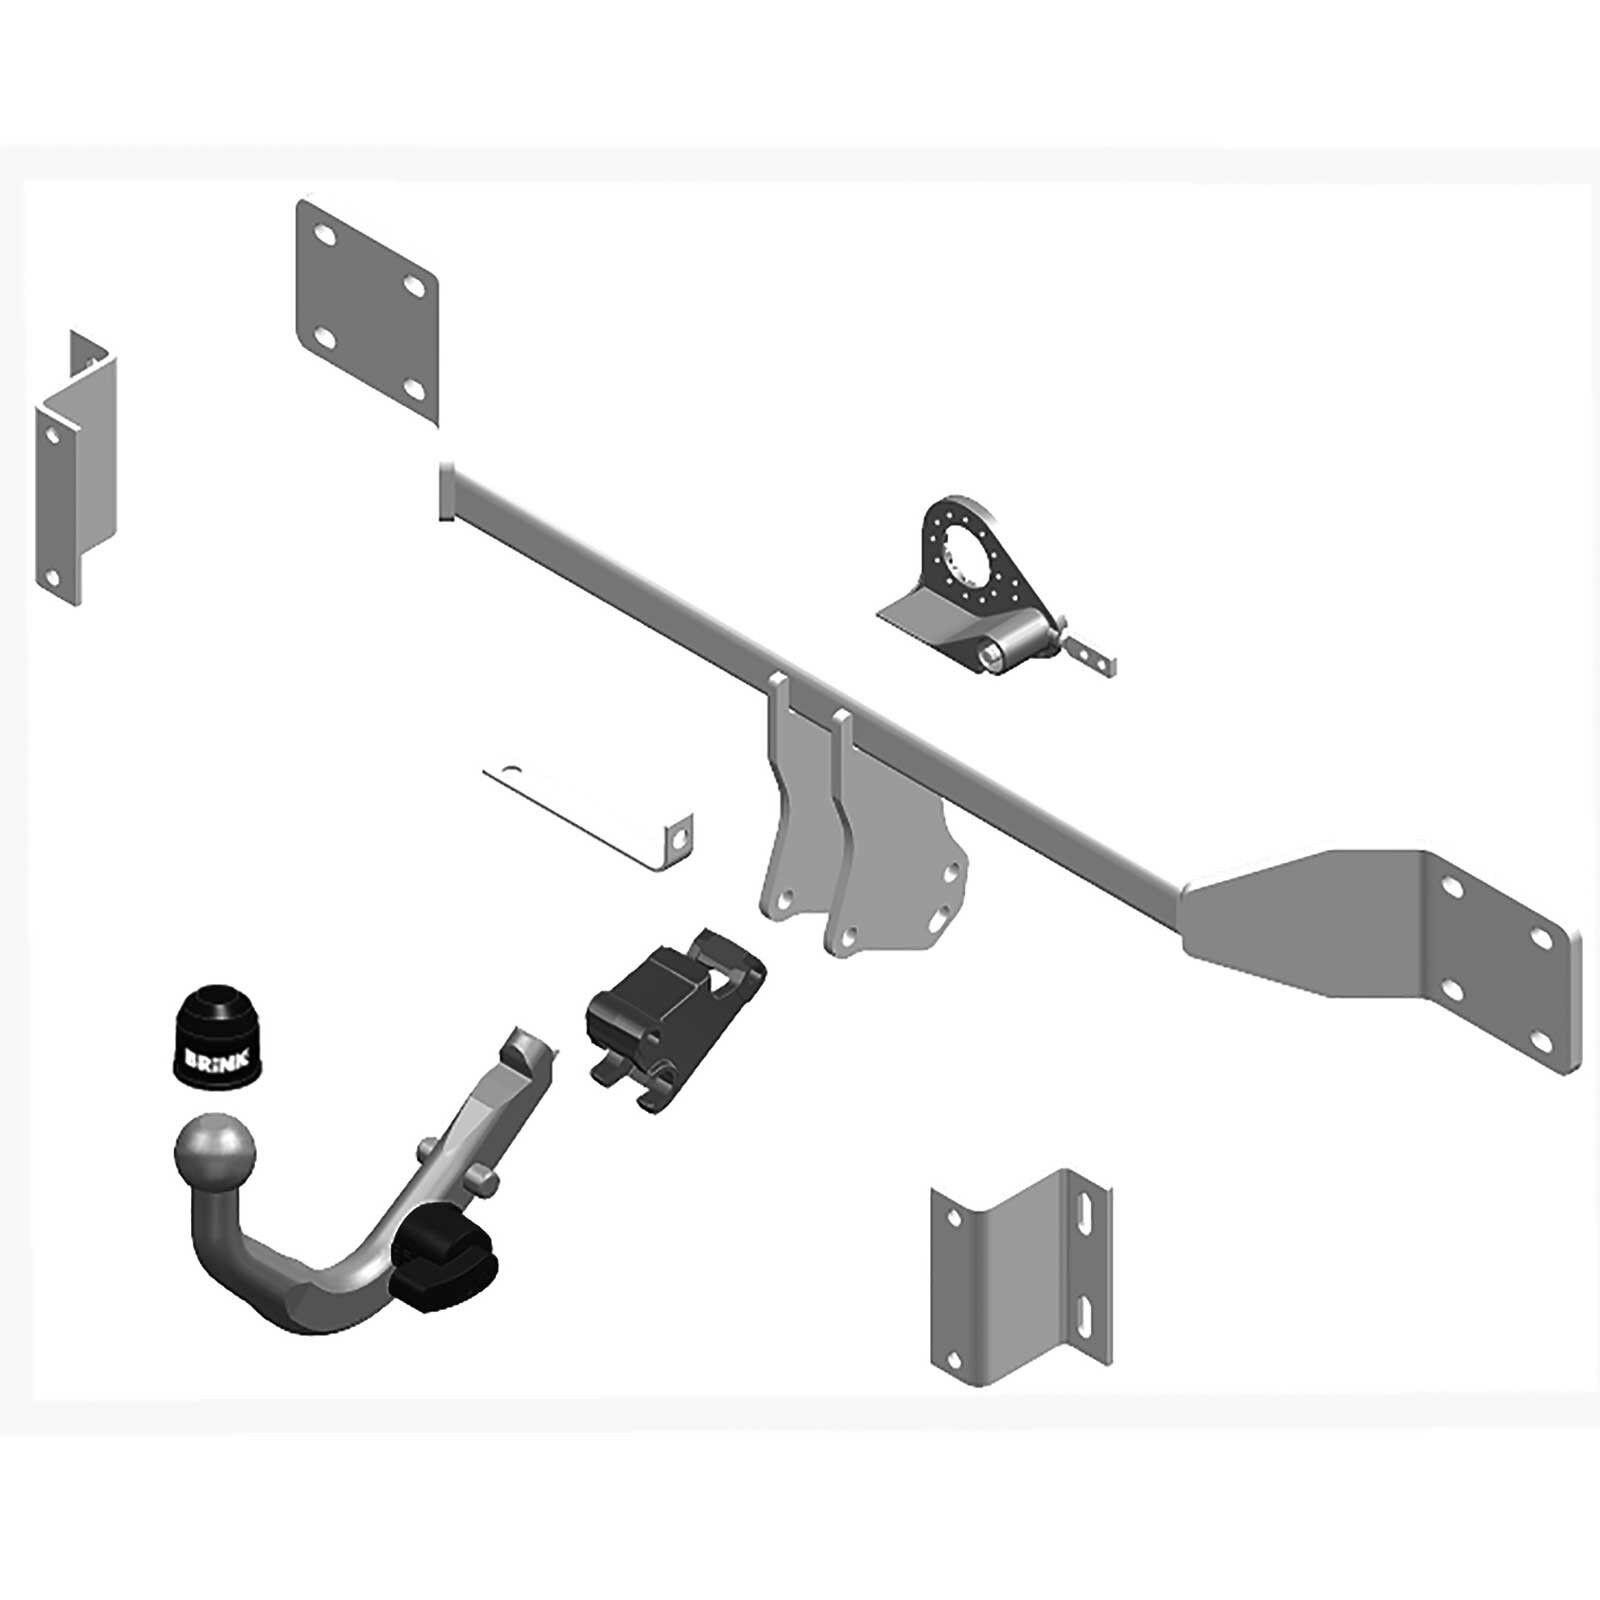 Detachable Tow Bar Brink Towbar for Ford Focus II Estate 2004-2012